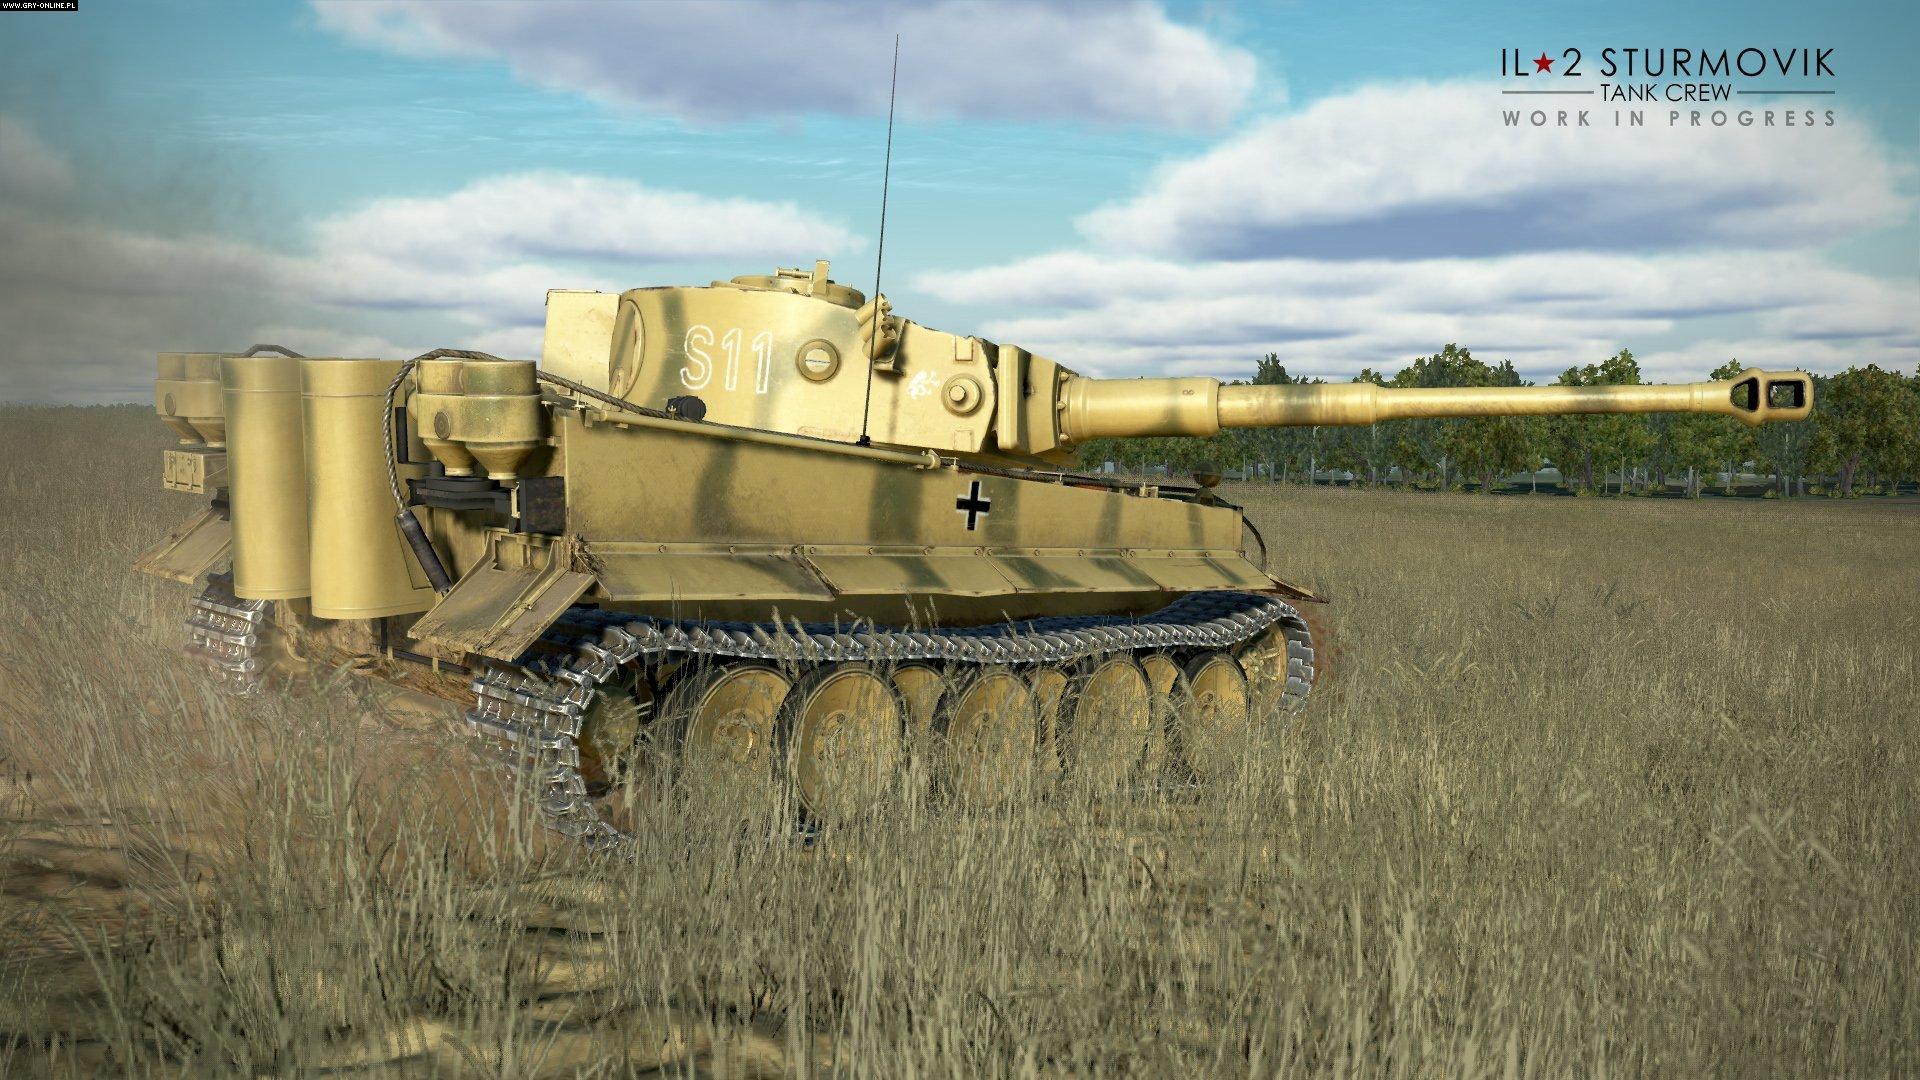 Simulator Games Pc 2018 >> Il-2 Sturmovik: Tank Crew - Clash at Prokhorovka - screenshots gallery - screenshot 6/22 ...